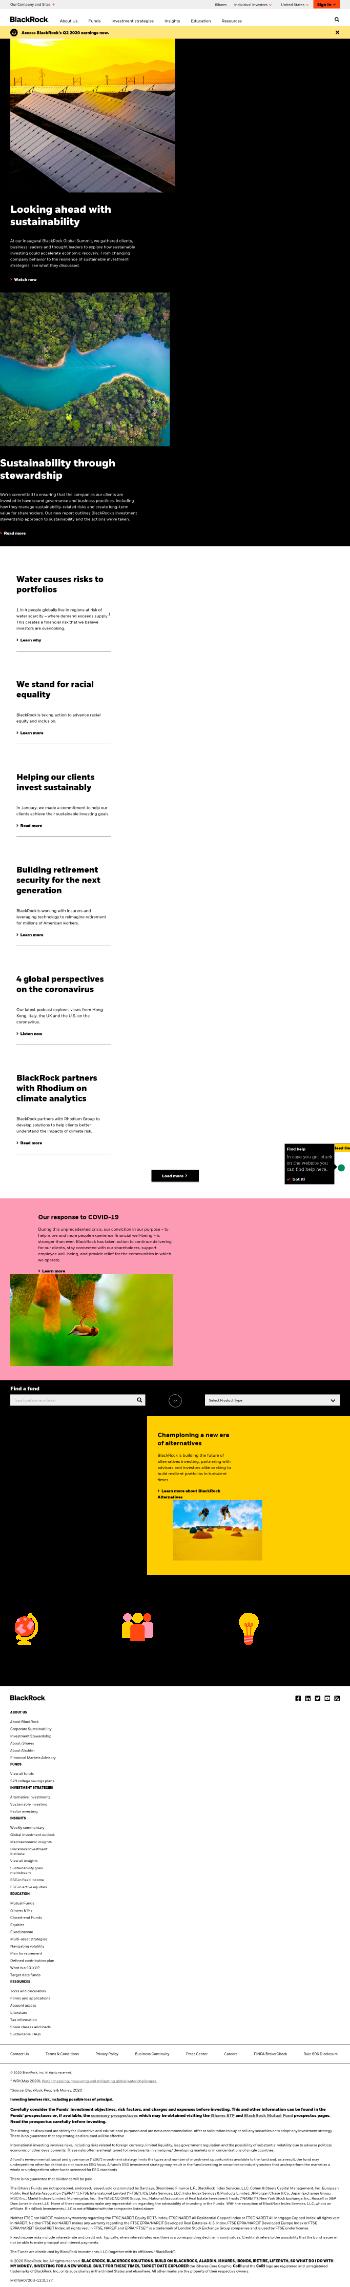 BlackRock Multi-Sector Income Trust Website Screenshot